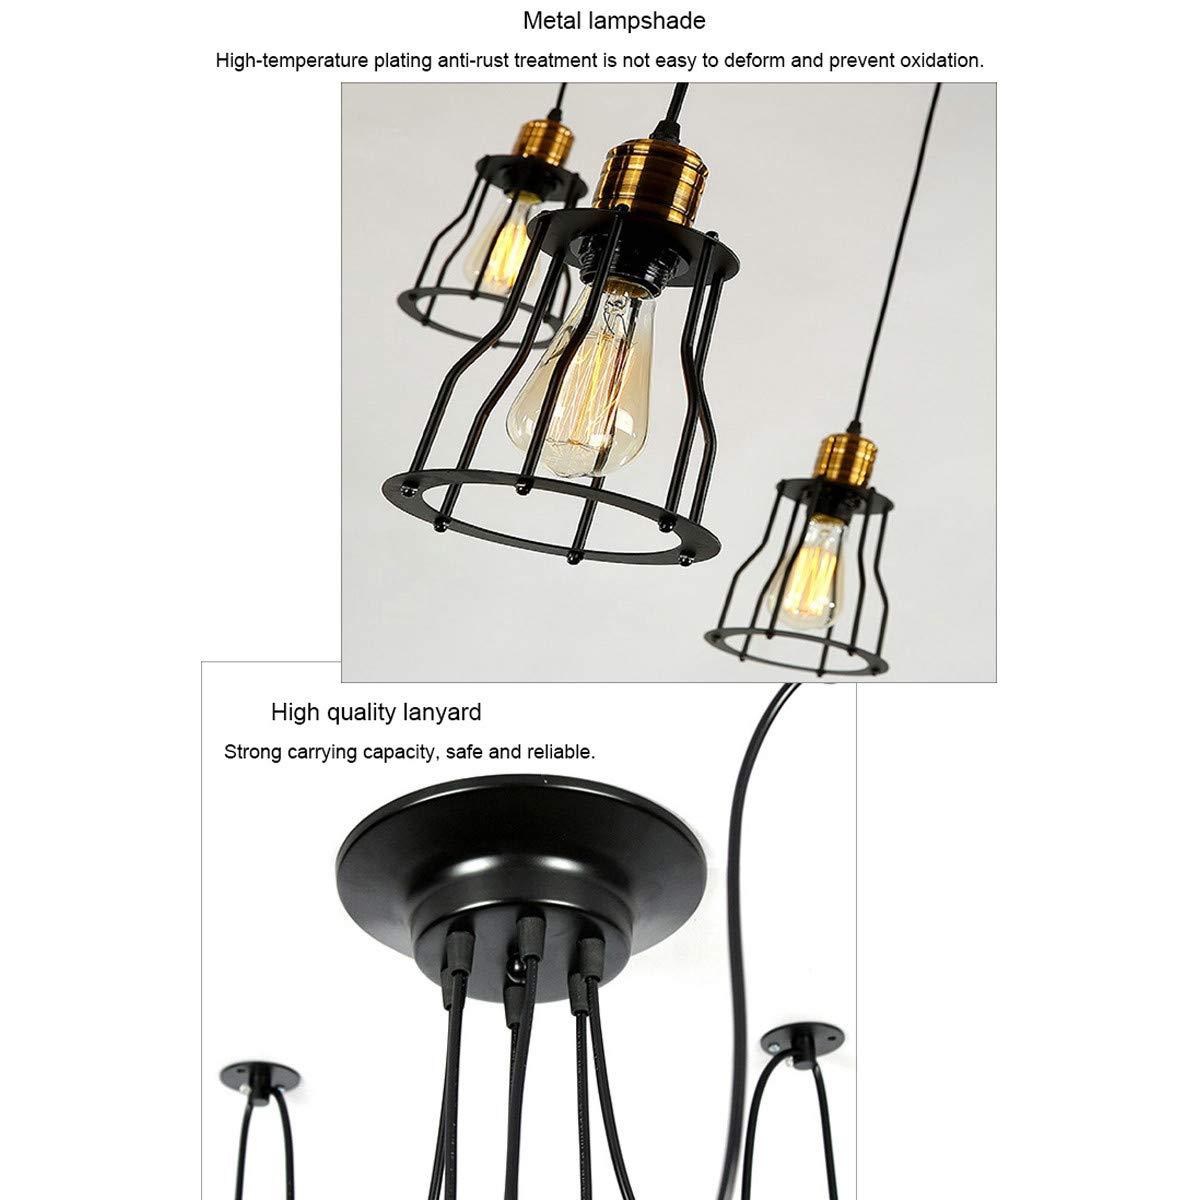 NANGE Vintage Chandelier,Edison Multiple Adjustable DIY Metal Wire Cage Pendant Lighting,Modern Chic Industrial Dining Light,E27(Without Light Source) (Color : Warm White, Size : AC 220V) by NANGE (Image #3)